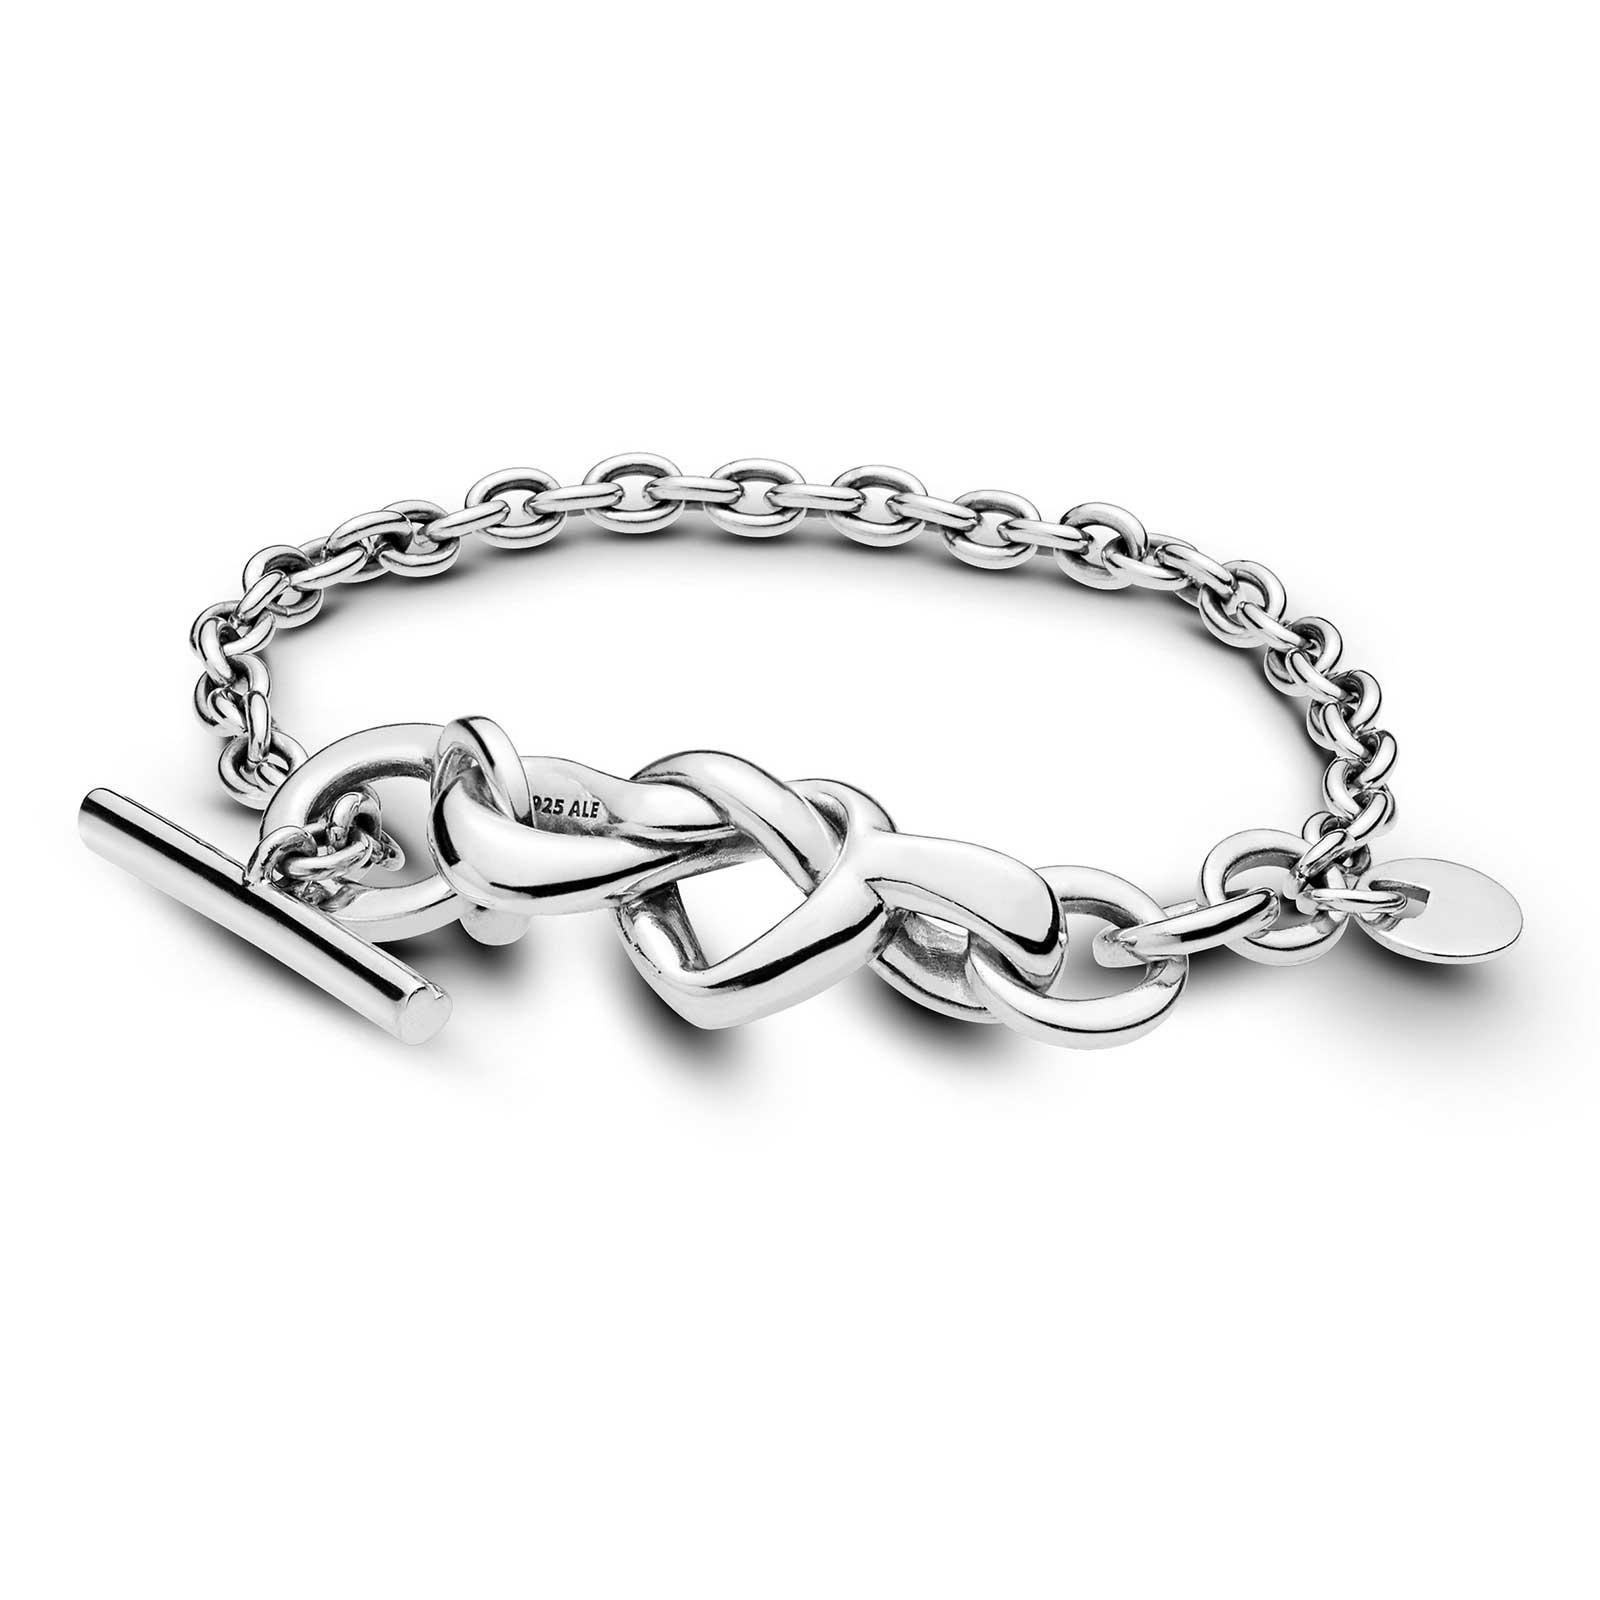 4b648aa5f PANDORA Knotted Heart Bracelet: Precious Accents, Ltd.